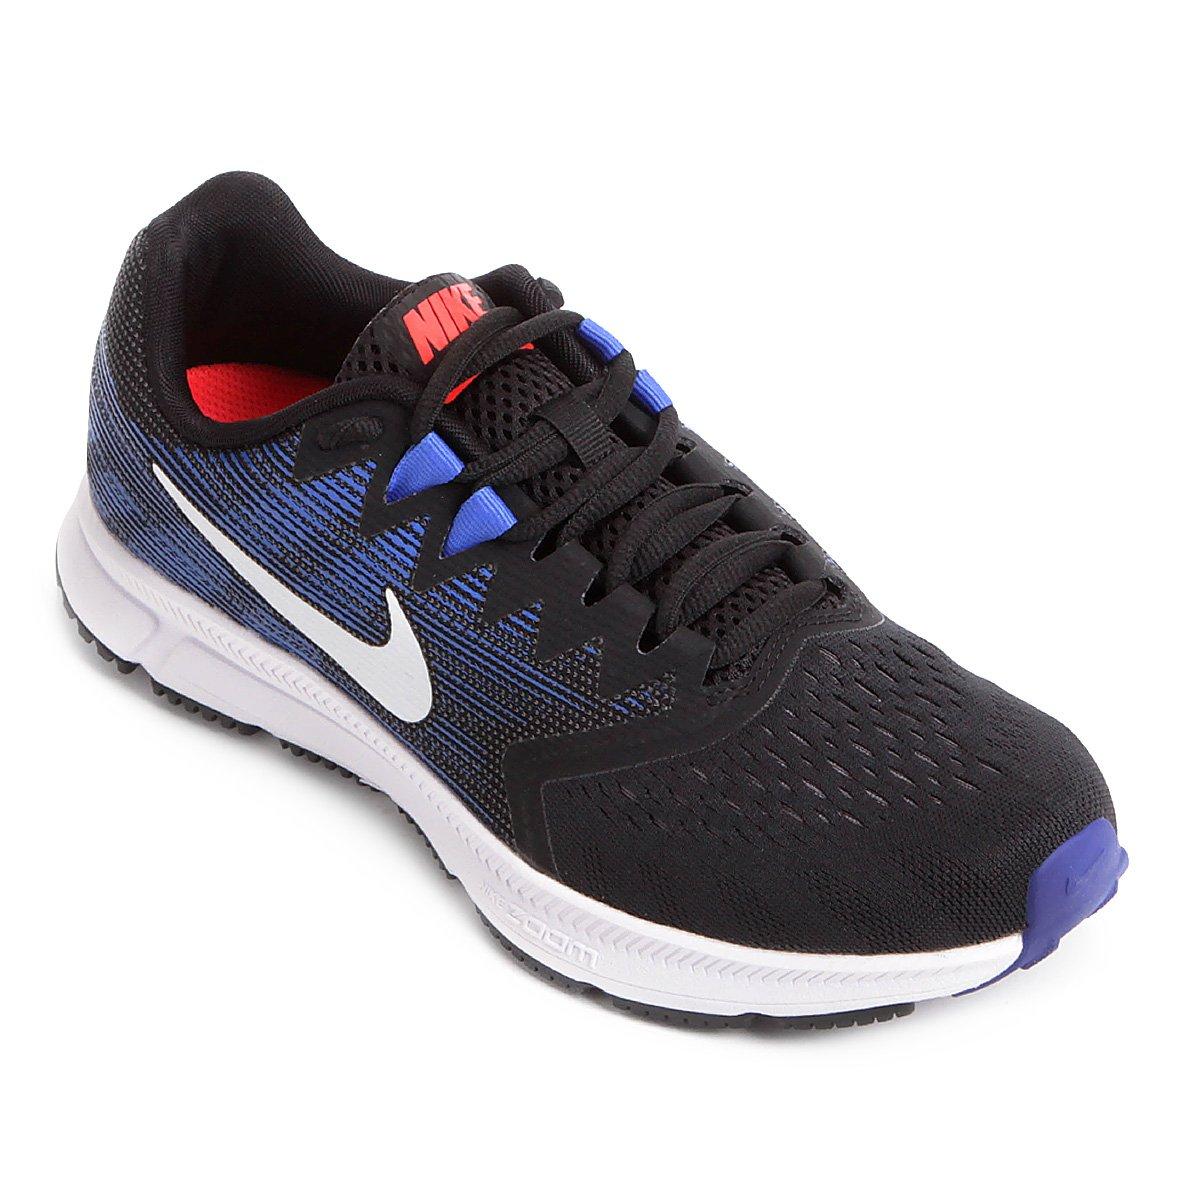 2 Zoom Preto Tênis Tênis Span Branco e Nike Masculino Nike wCR41Taq